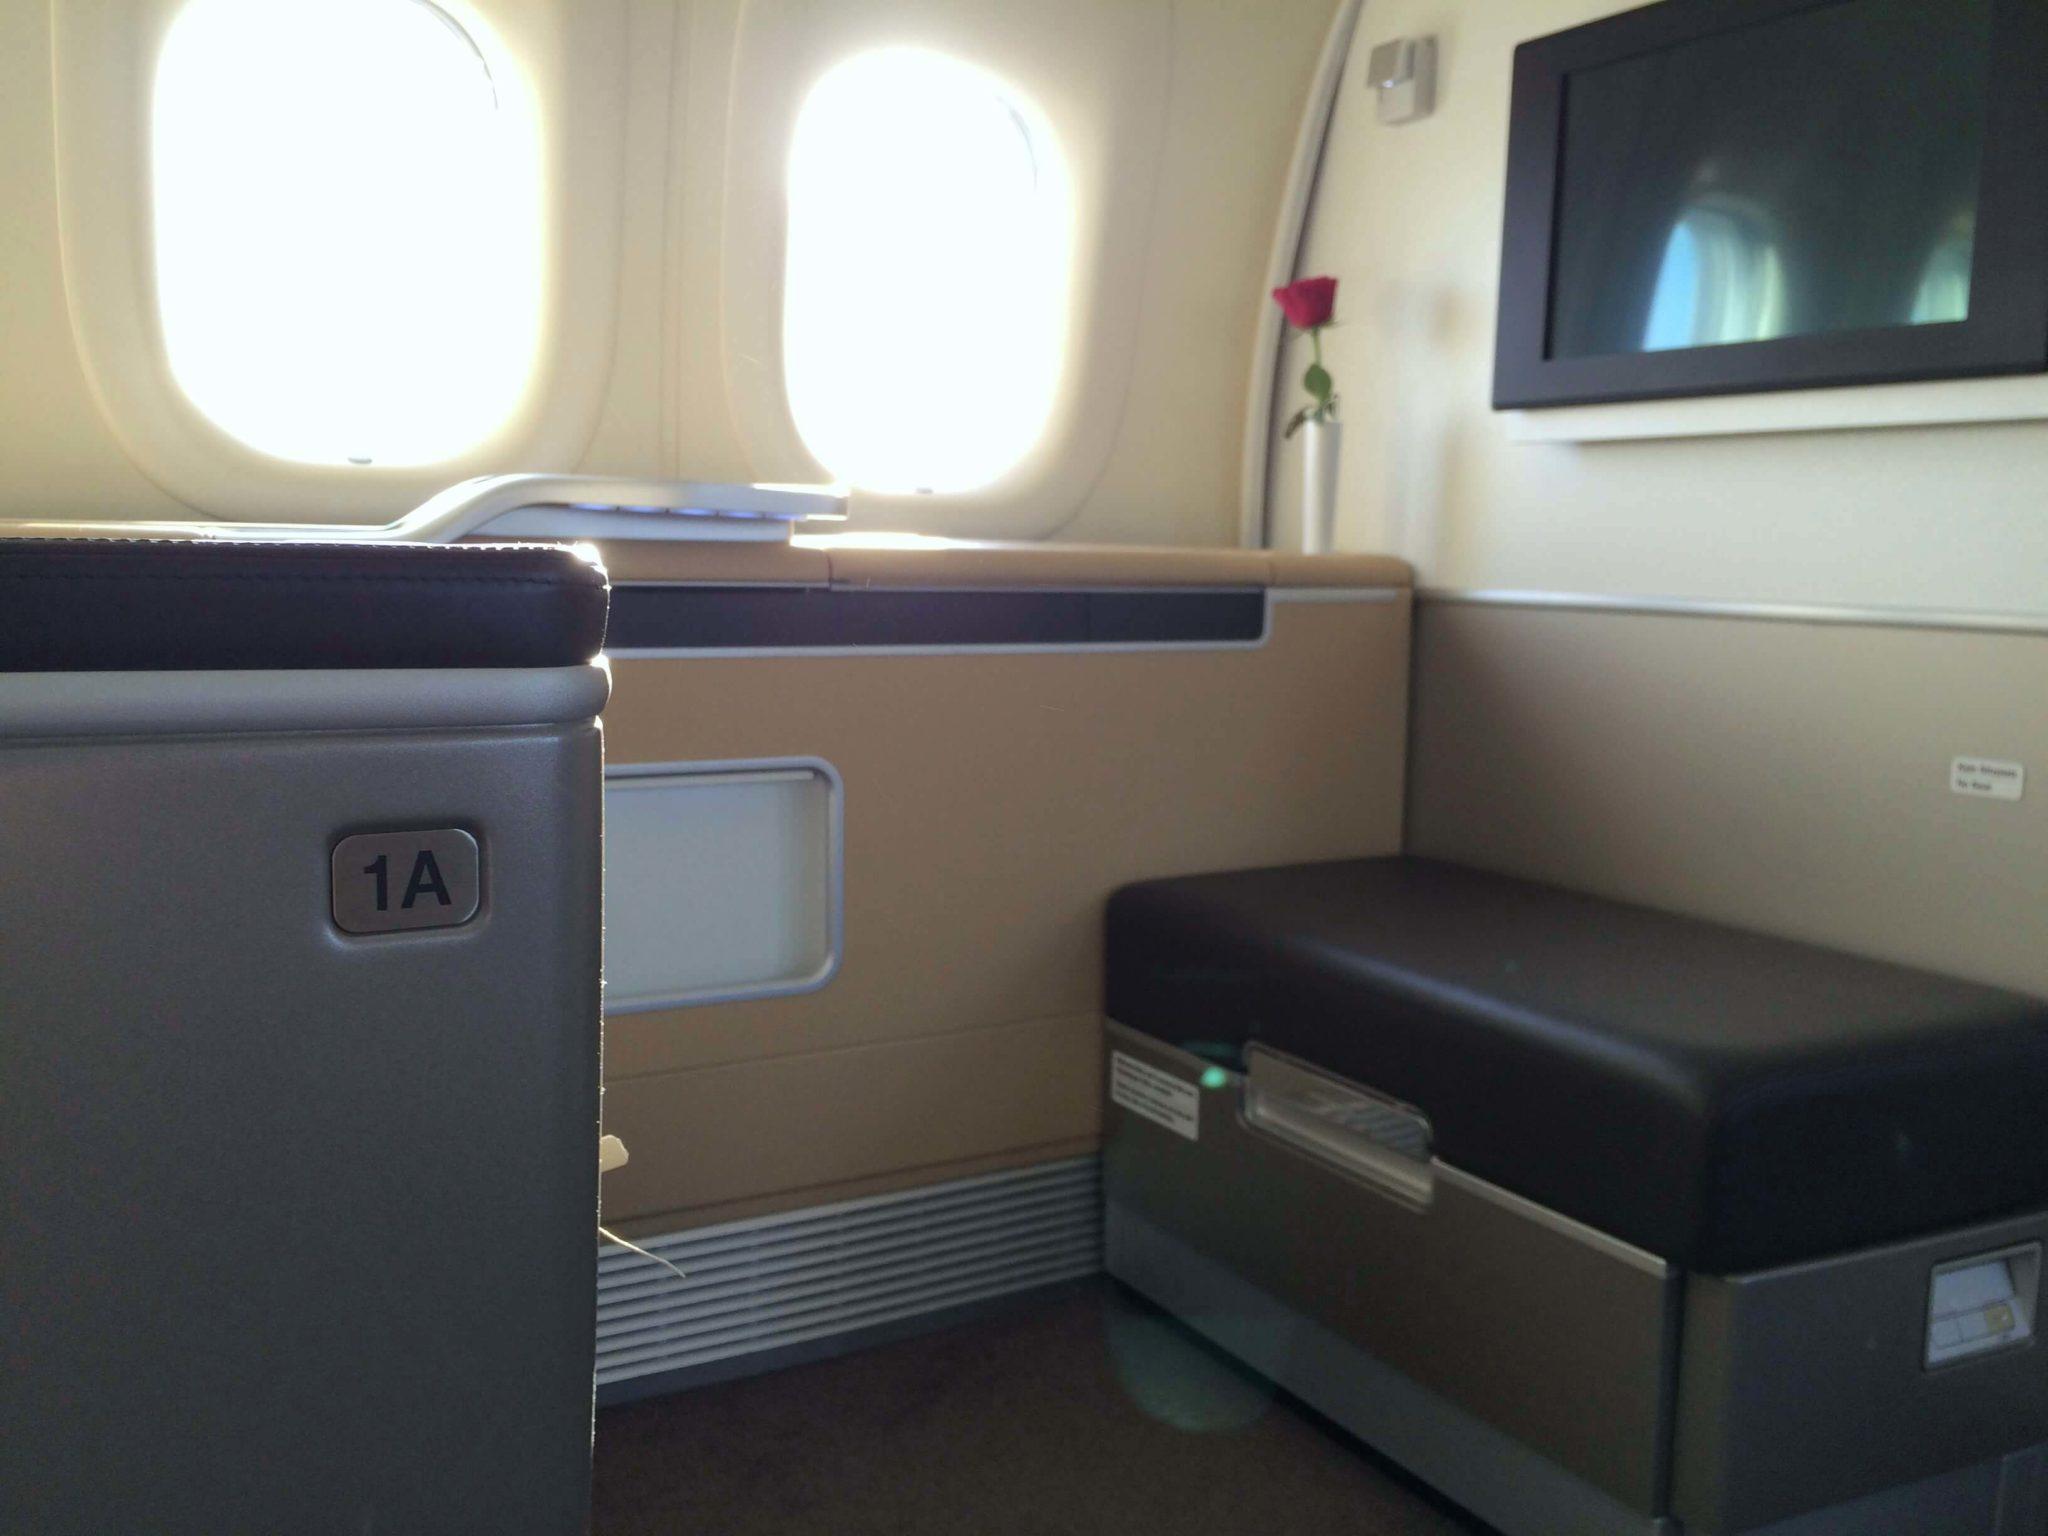 Asiento 1A, Lufthansa first class Boeing 747-800